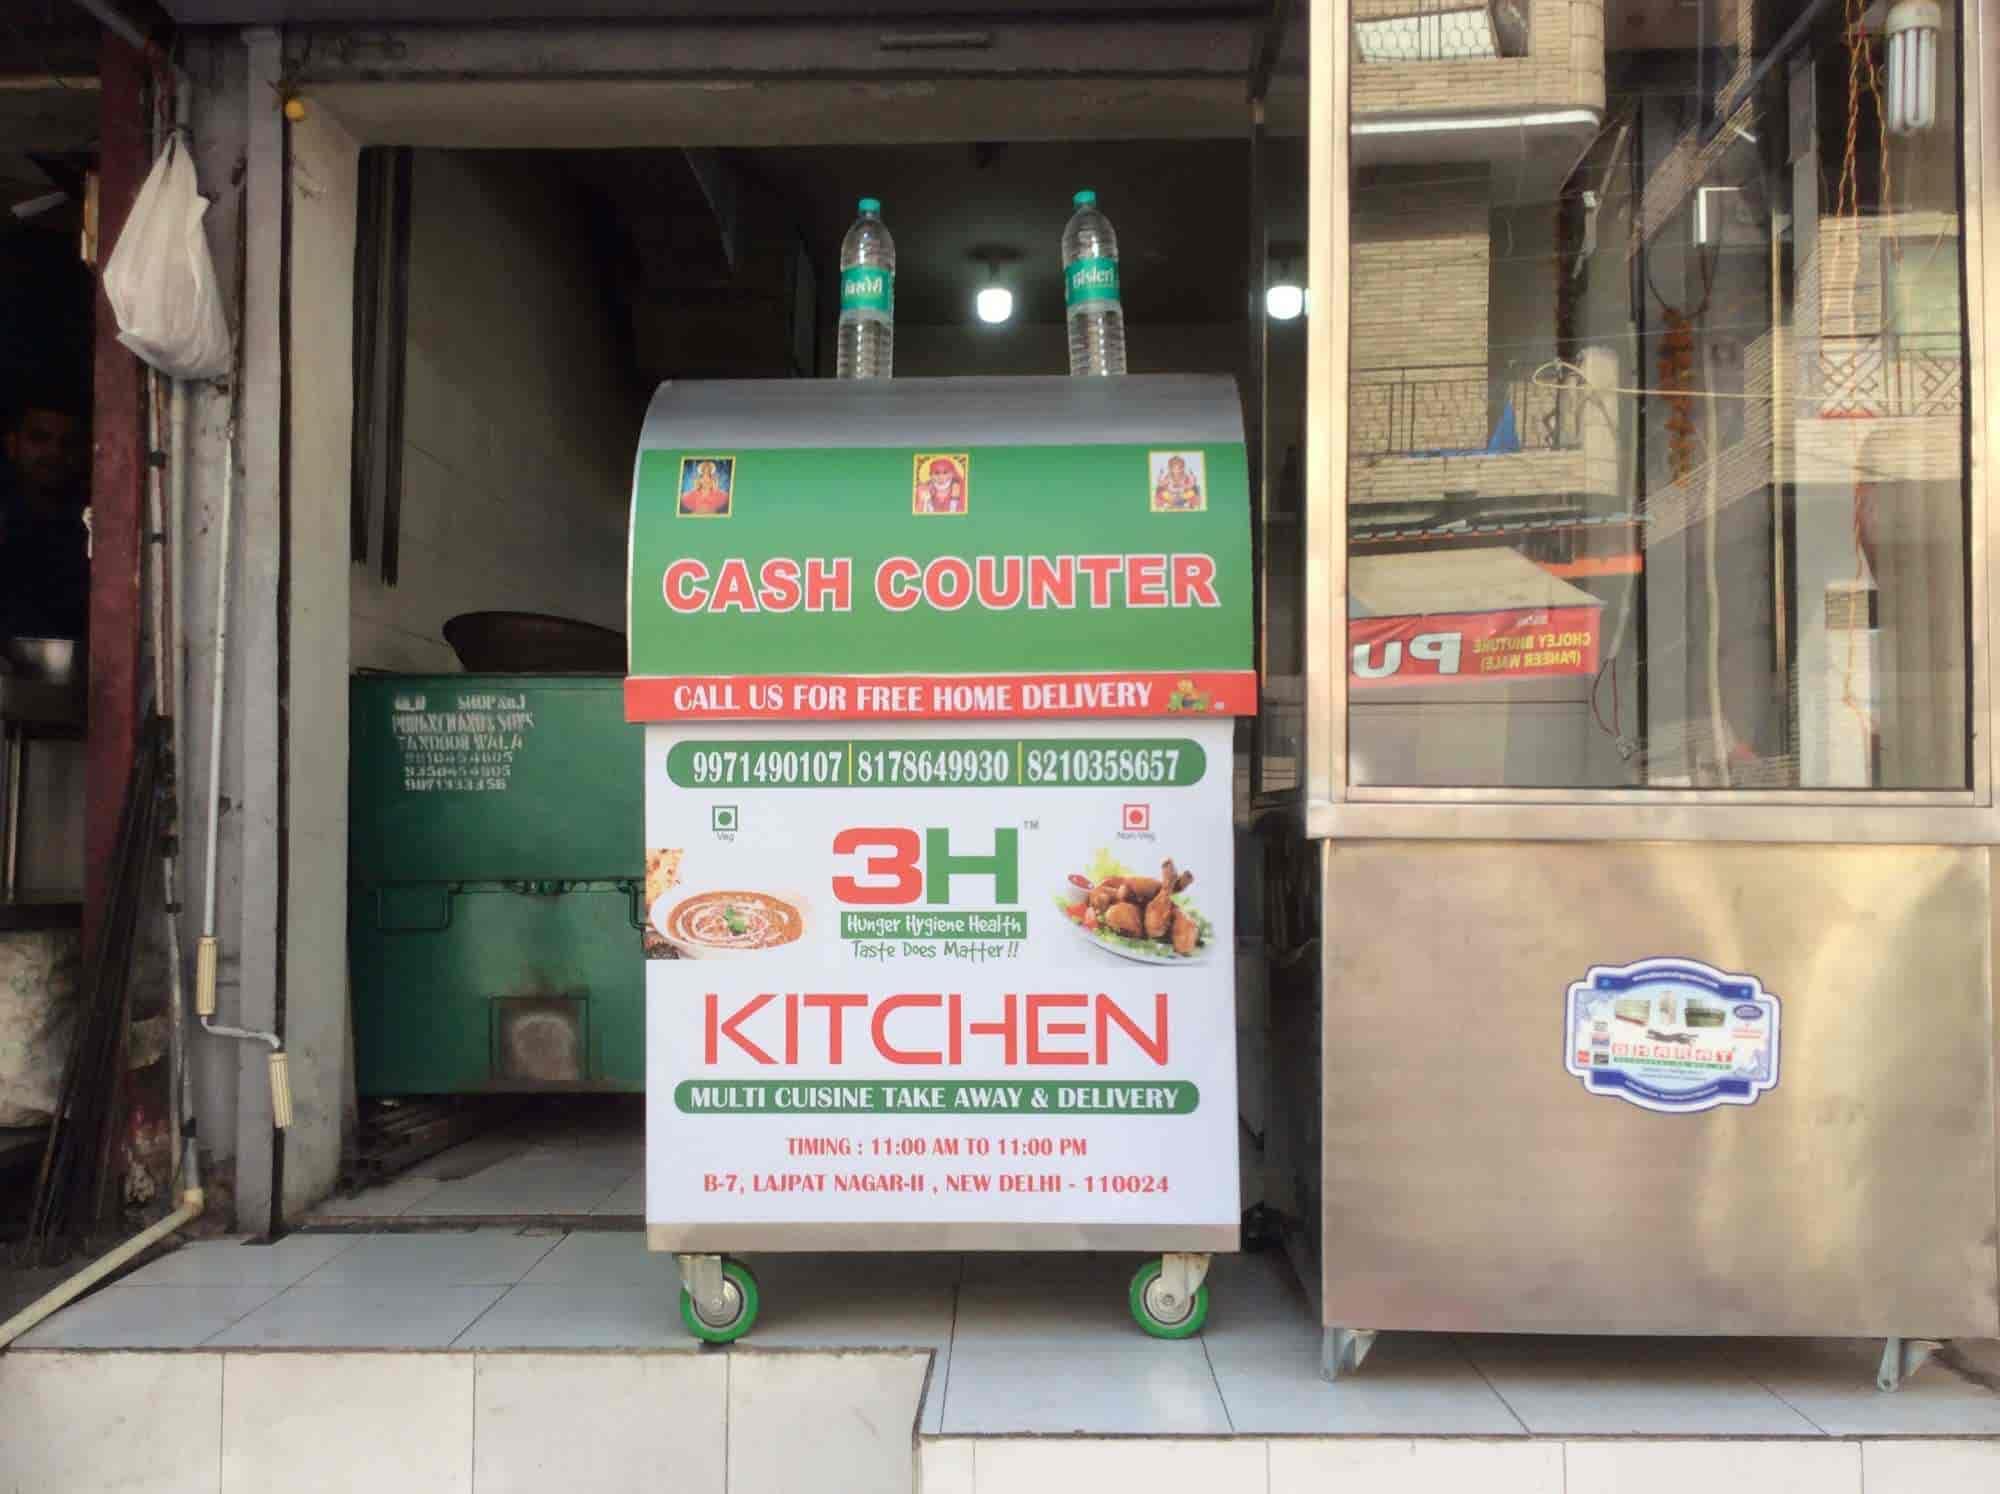 3h Kitchen Lajpat Nagar 2 Delhi